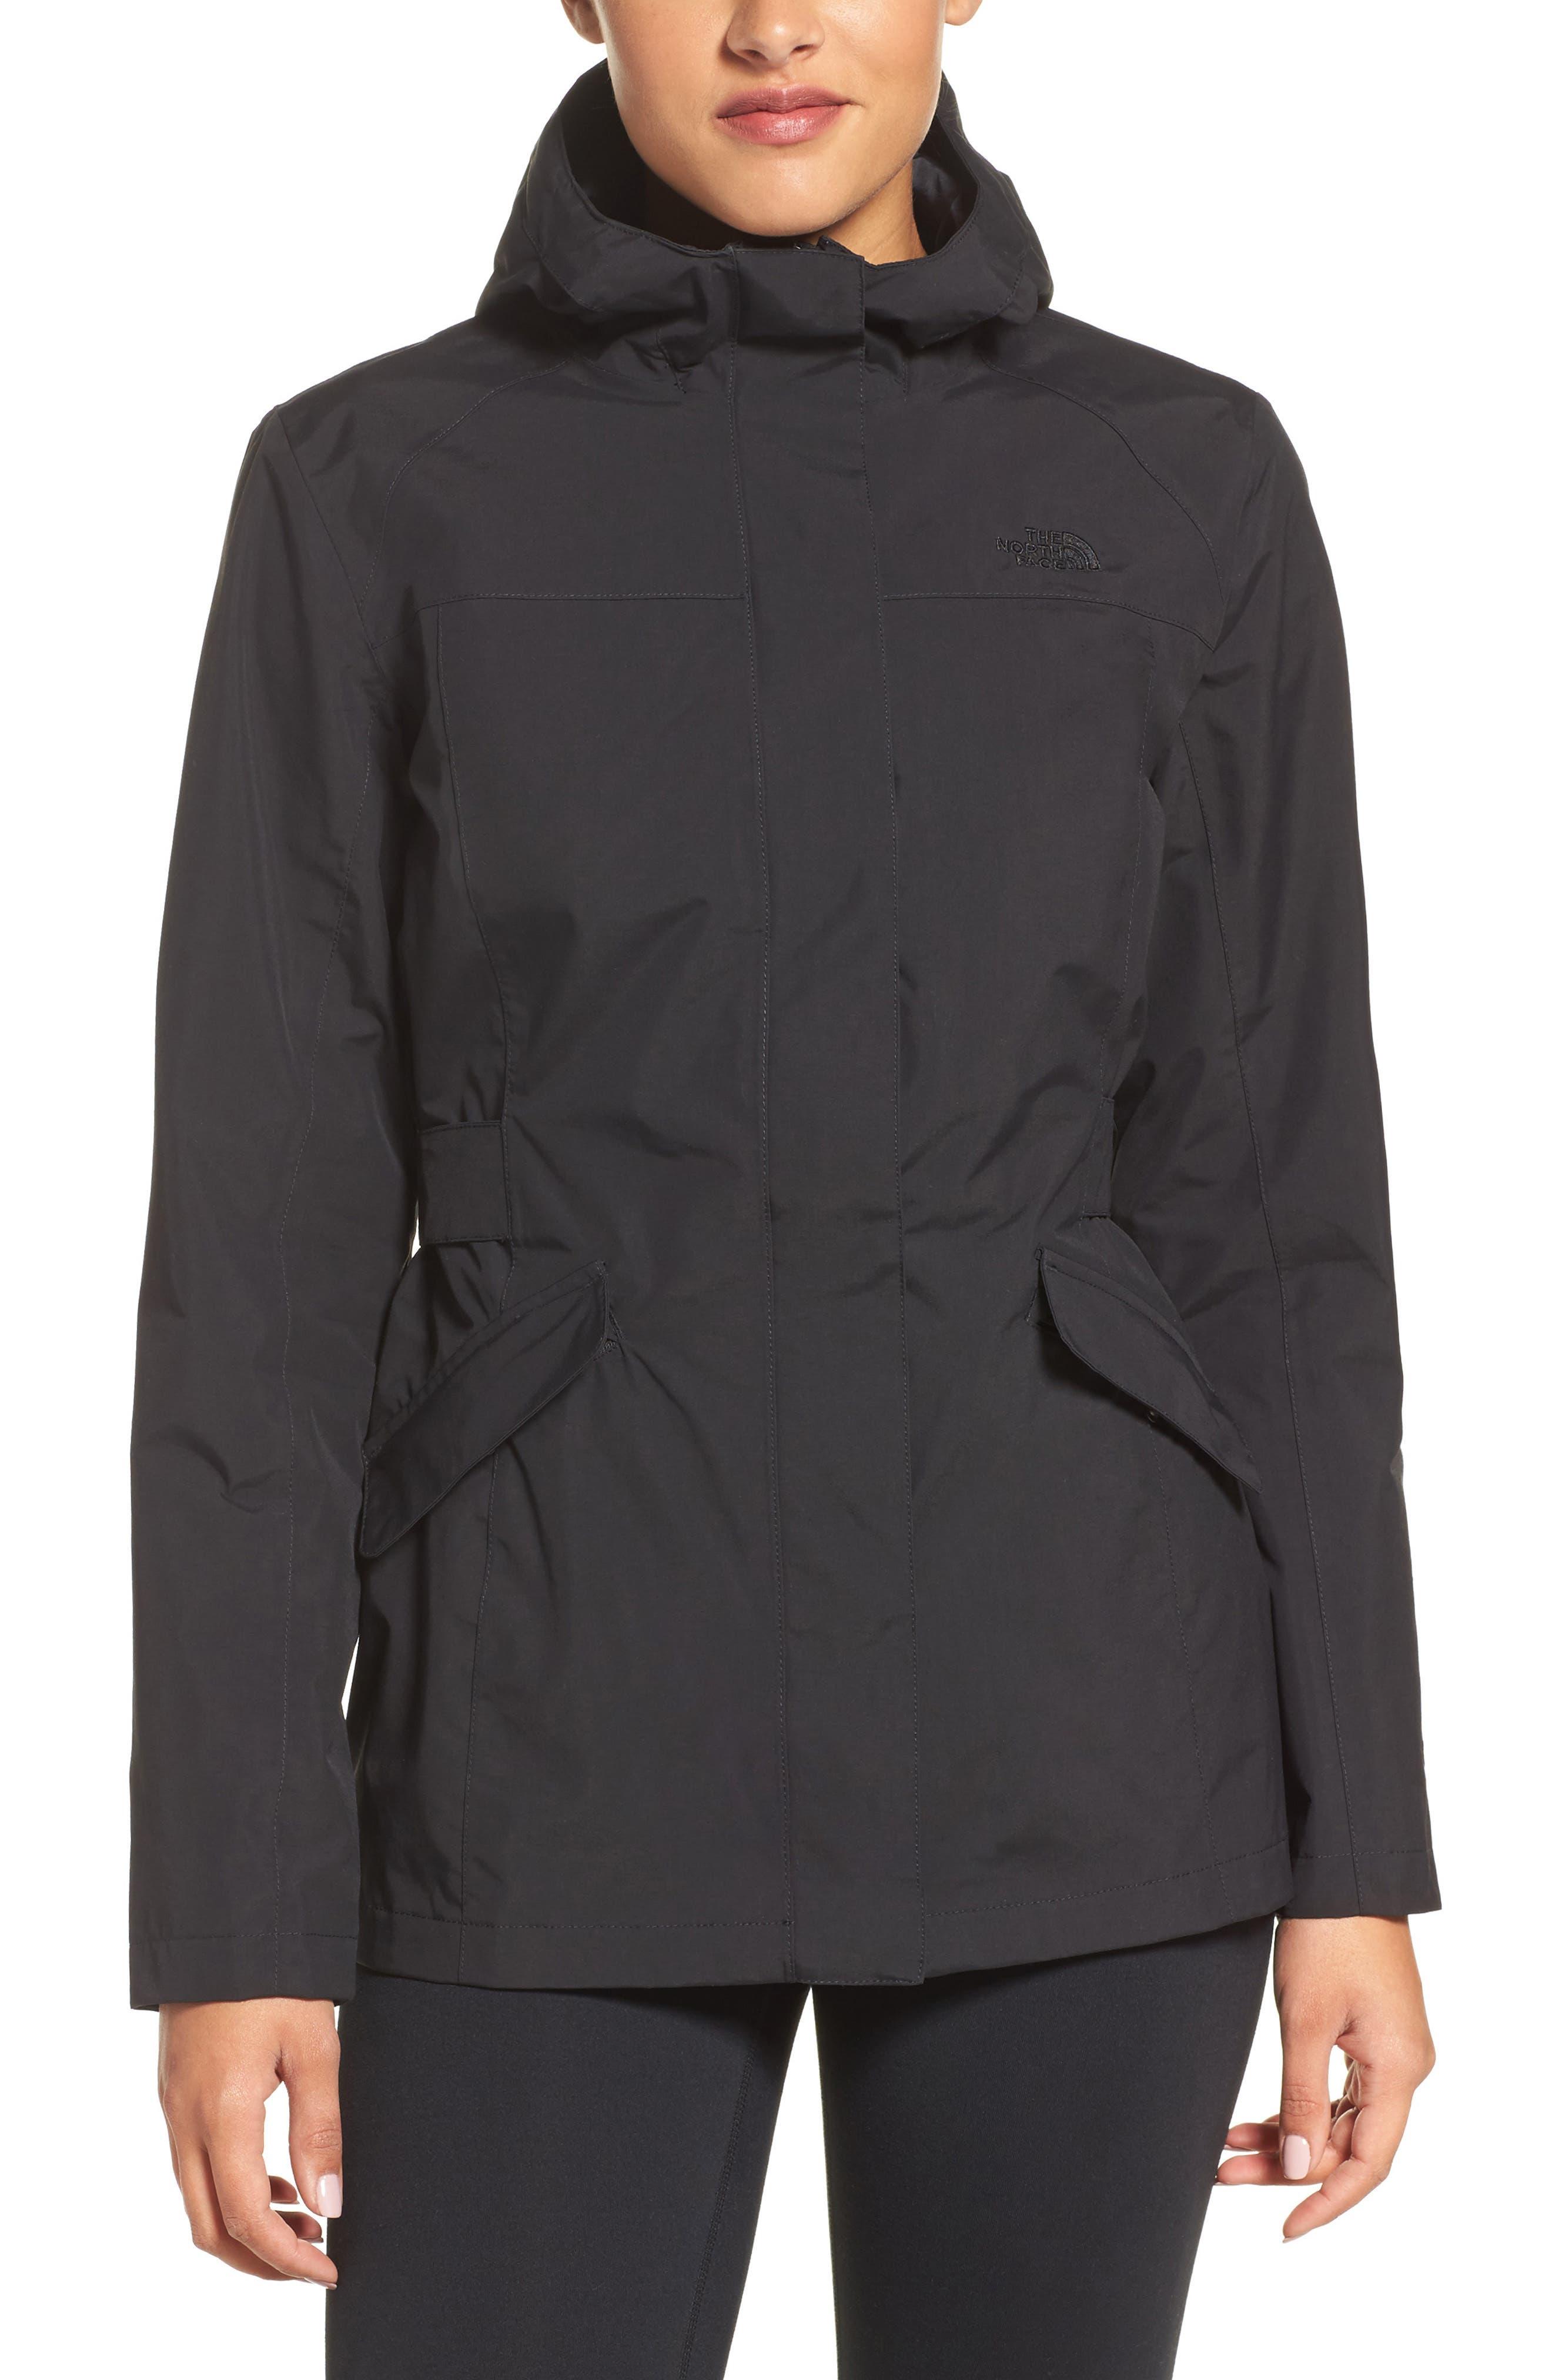 THE NORTH FACE Kindling Waterproof Jacket